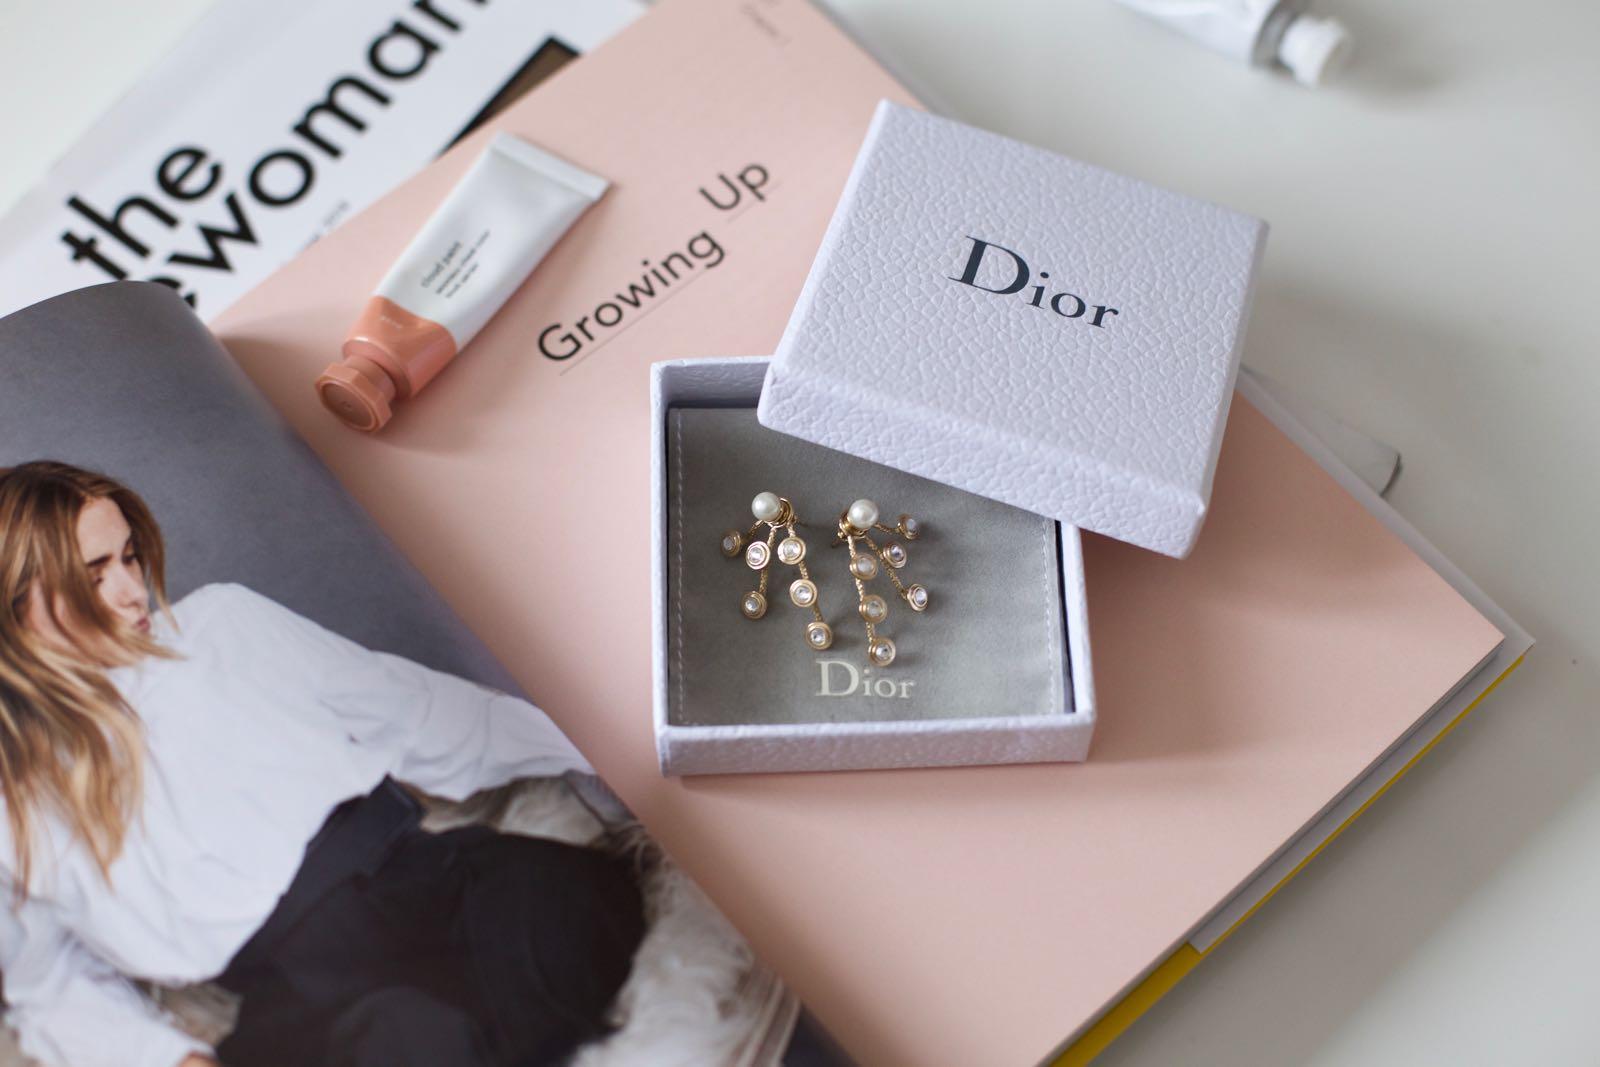 Constellation earrings: Dior